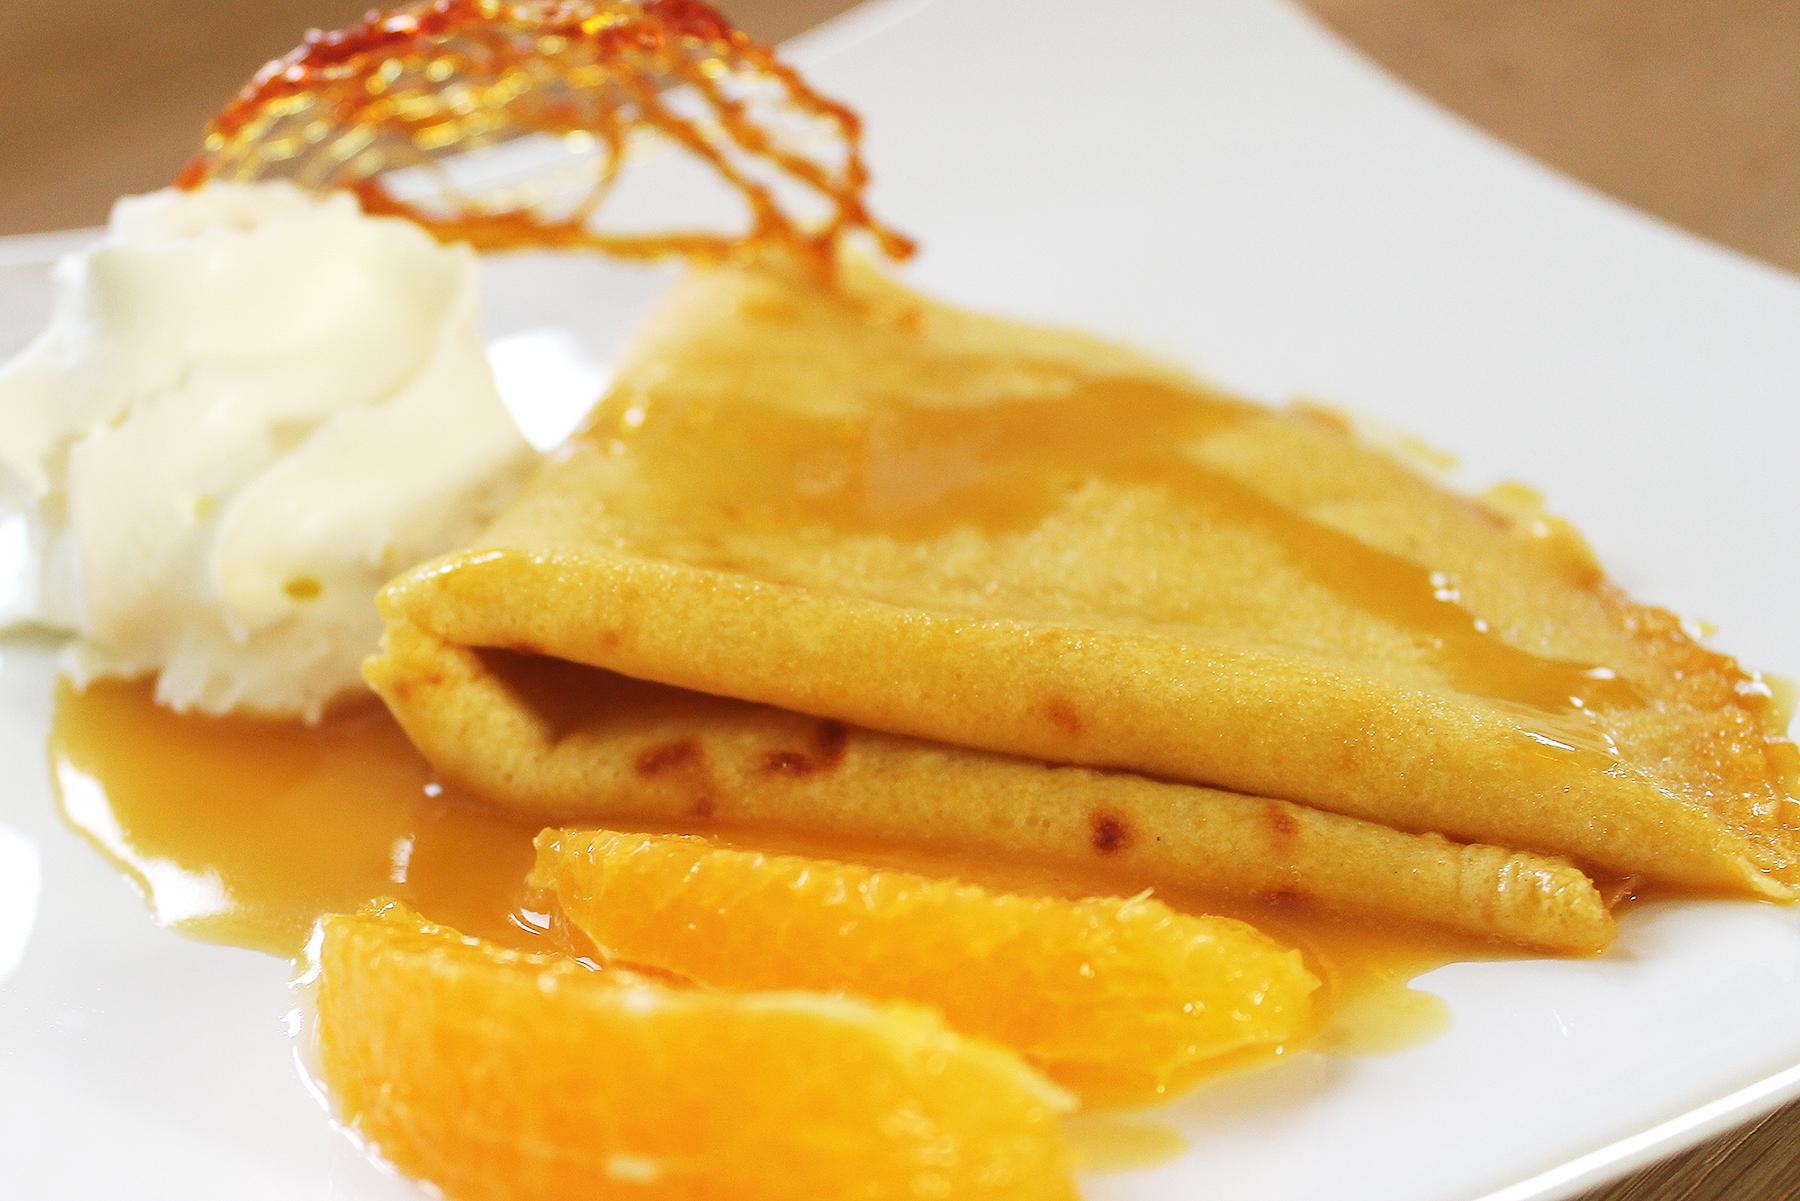 Picture of Crêpes Suzette - French Orange Crepes Dessert